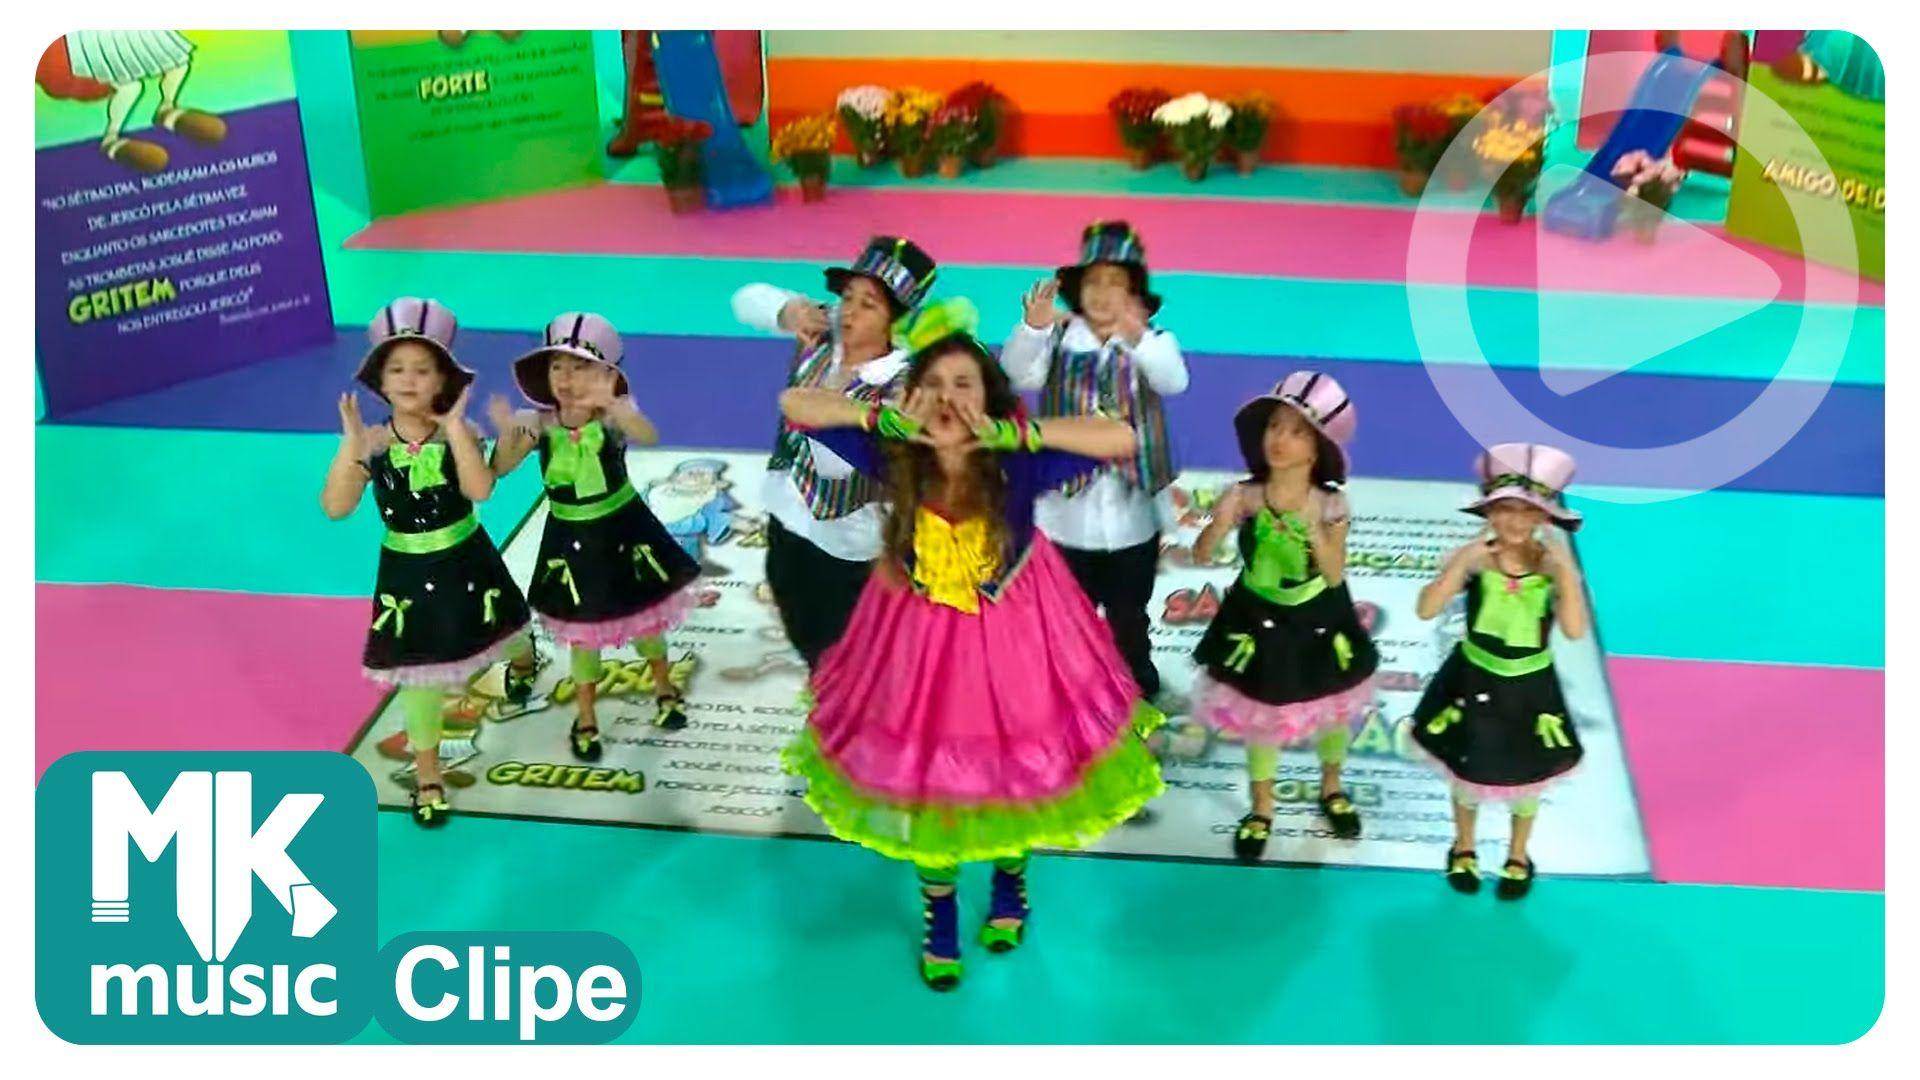 Pin De Maria Araujo Em Musica Para Festa Infantil Aline Barros